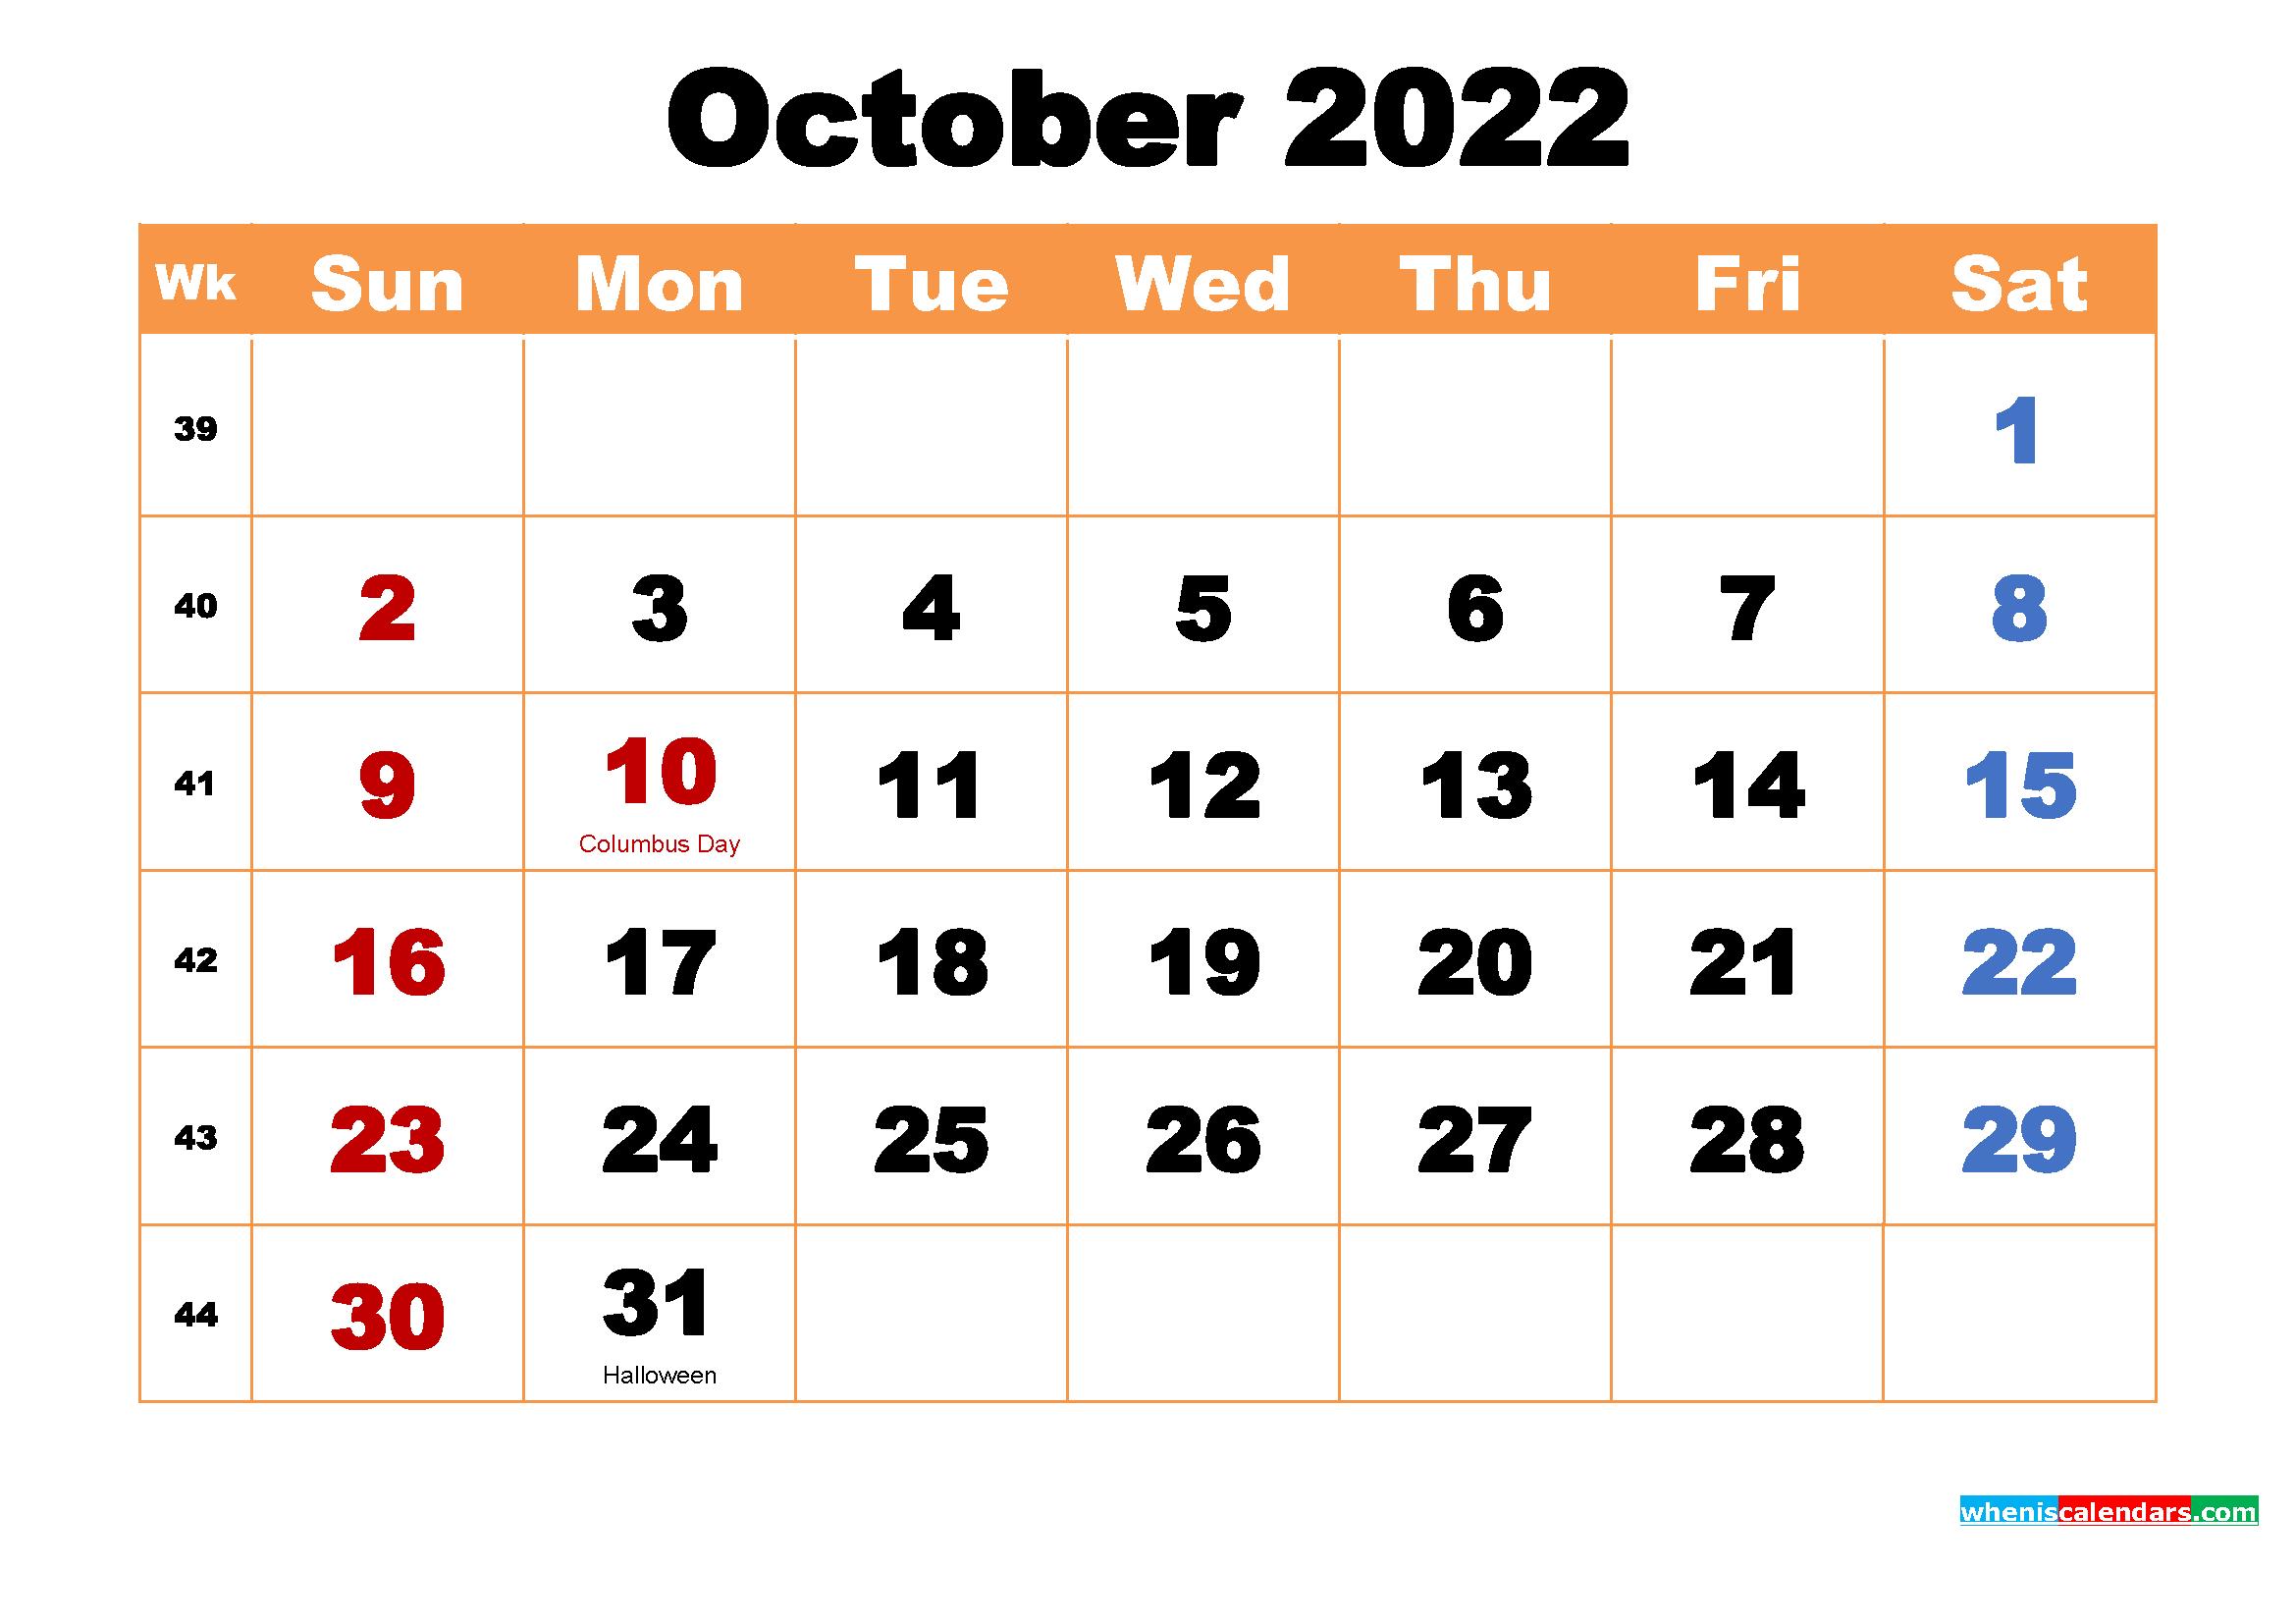 October 2022 Calendar Wallpaper High Resolution